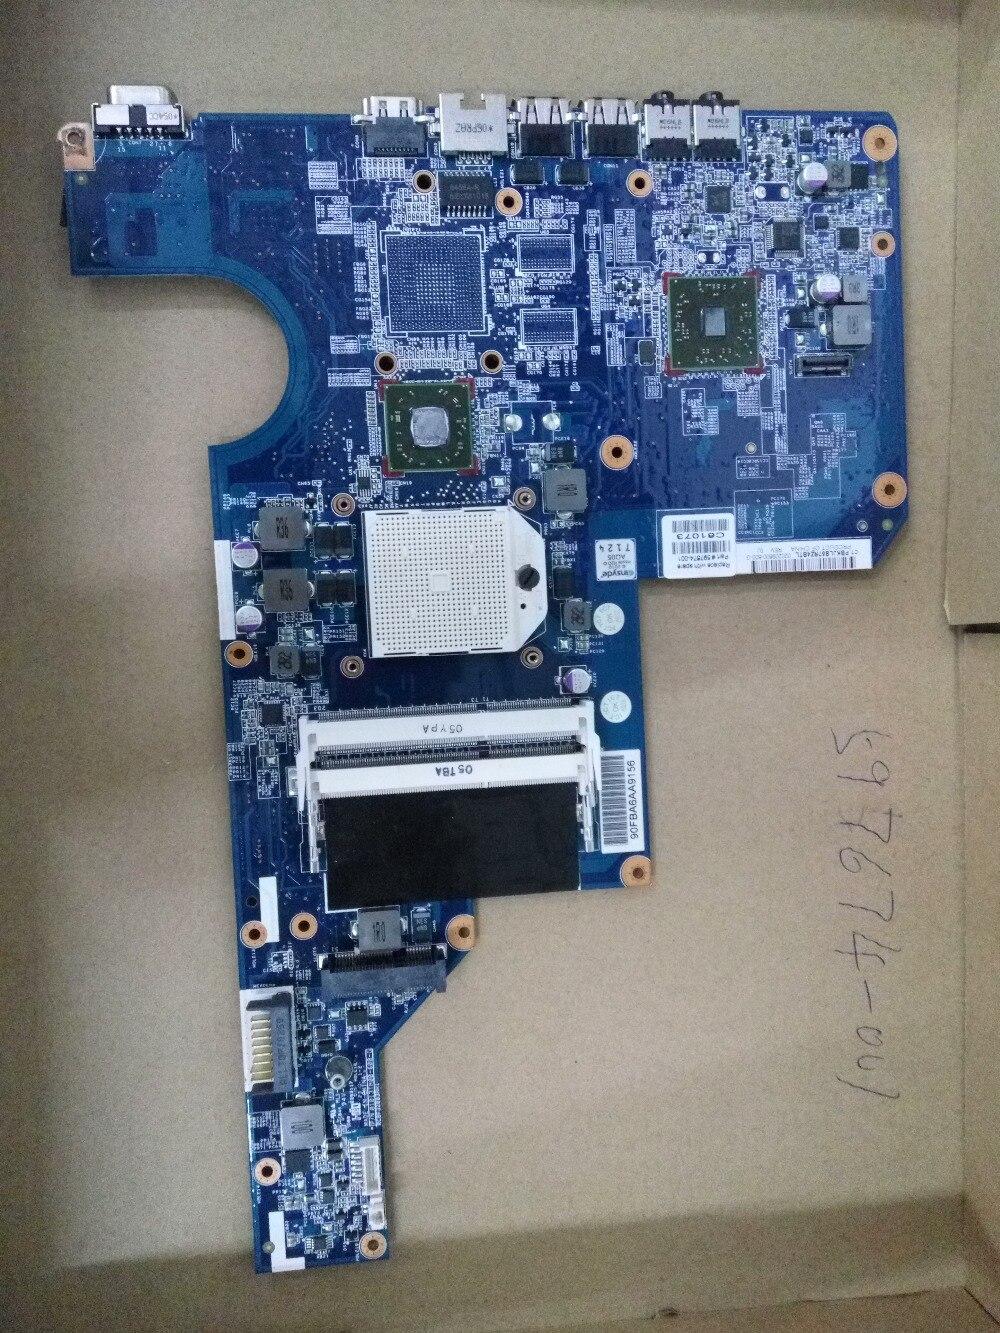 597674-001 lap CQ42 CQ43 G62 G4 full test lap connect board connect with motherboard motherboard board 639521 001 g6 g6 1000 connect with printer motherboard full test lap connect board